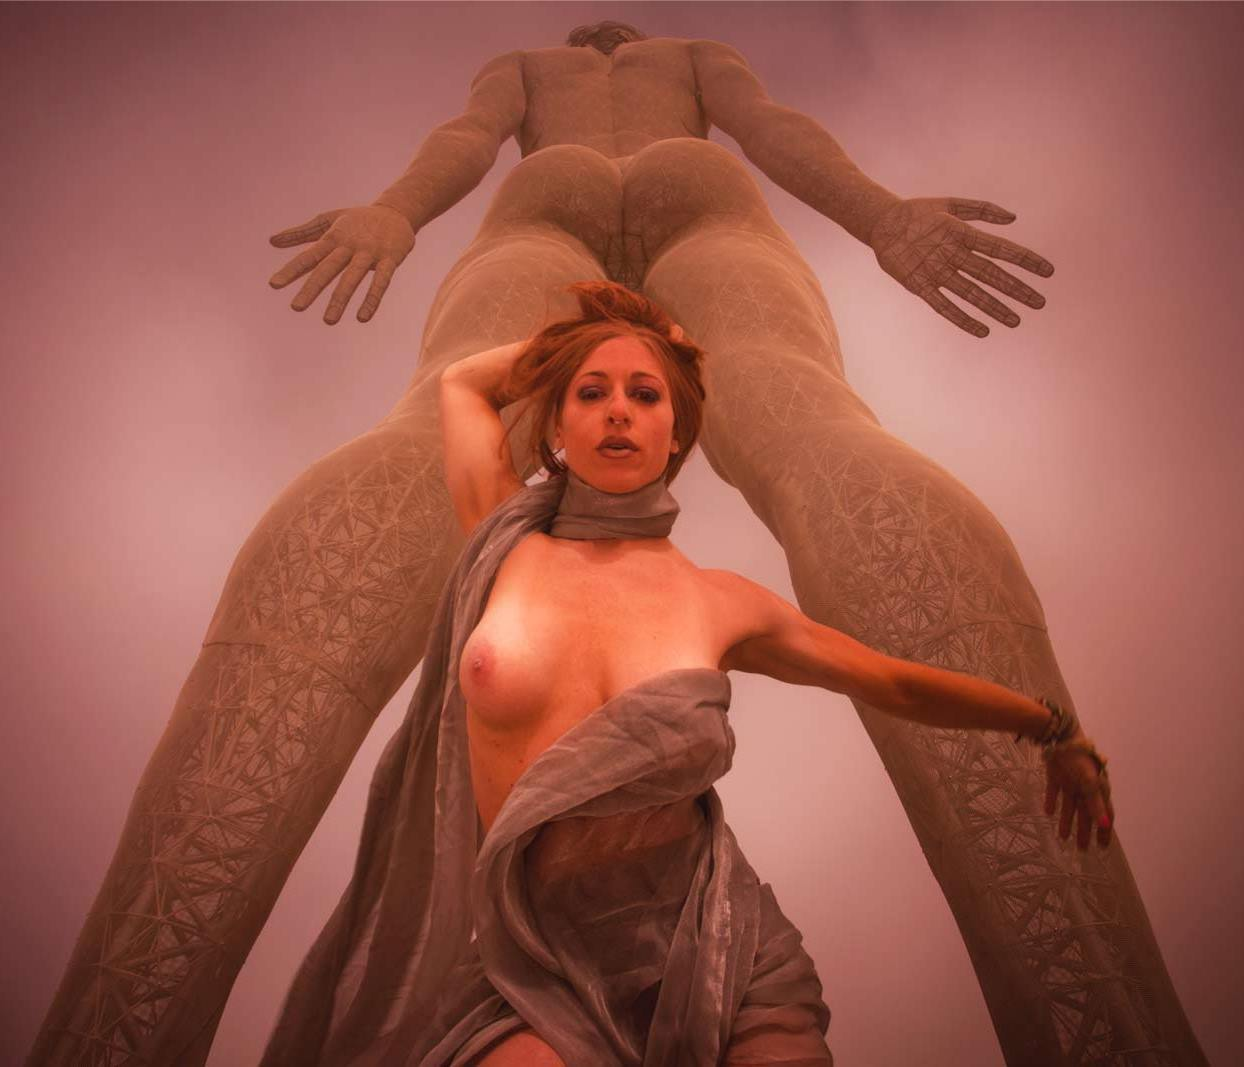 Burning-Man-2015-133-Playa-Dust-Storm-Jessica-Bliss-Naked-Chiffon